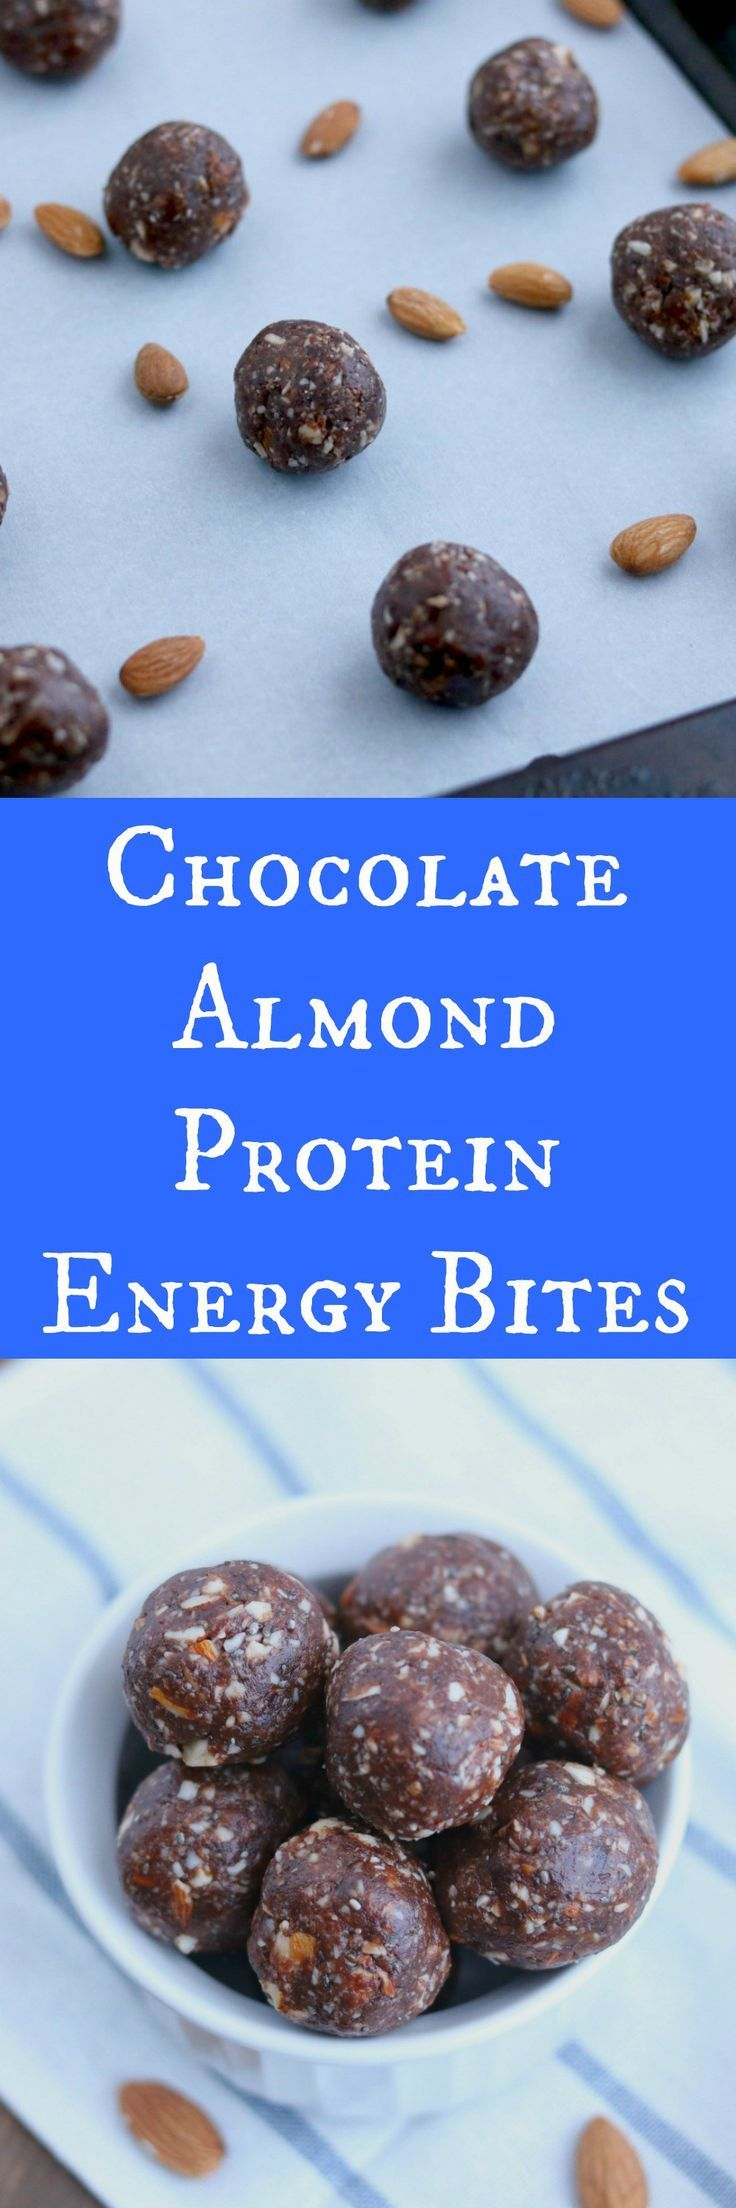 chocolate almond power energy bites